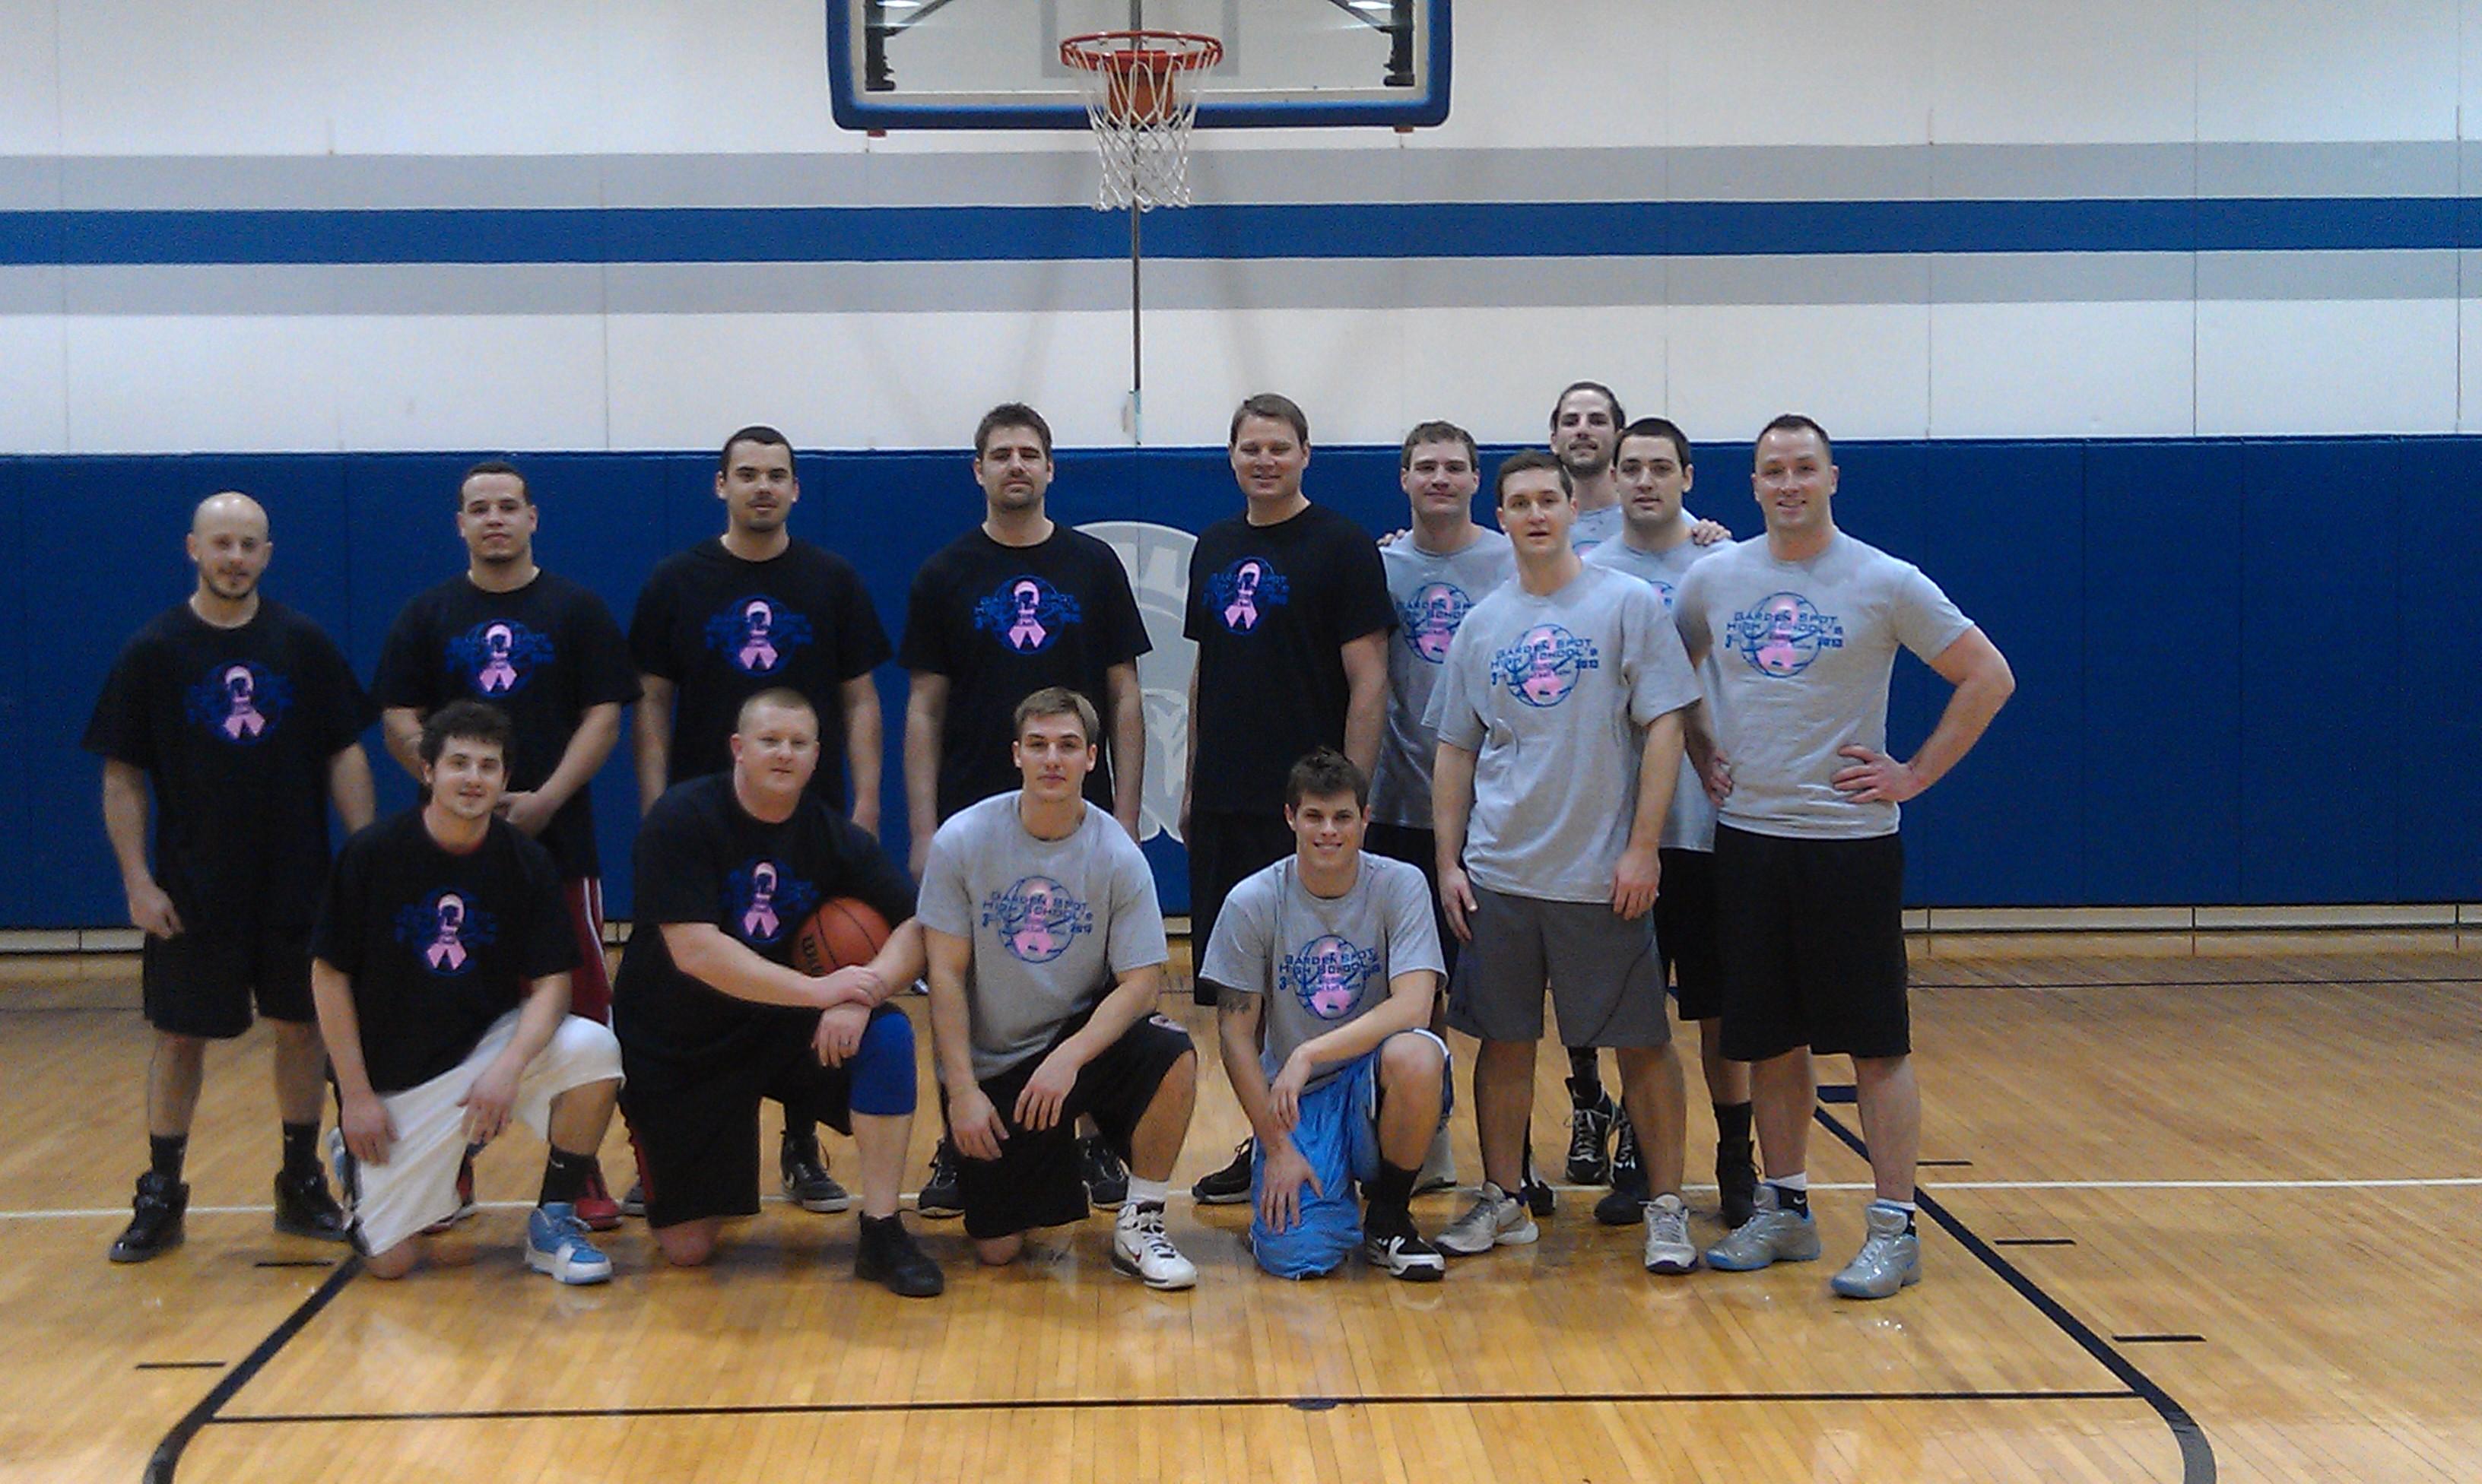 alumni basketball game benefits linda laub fund - Garden Spot